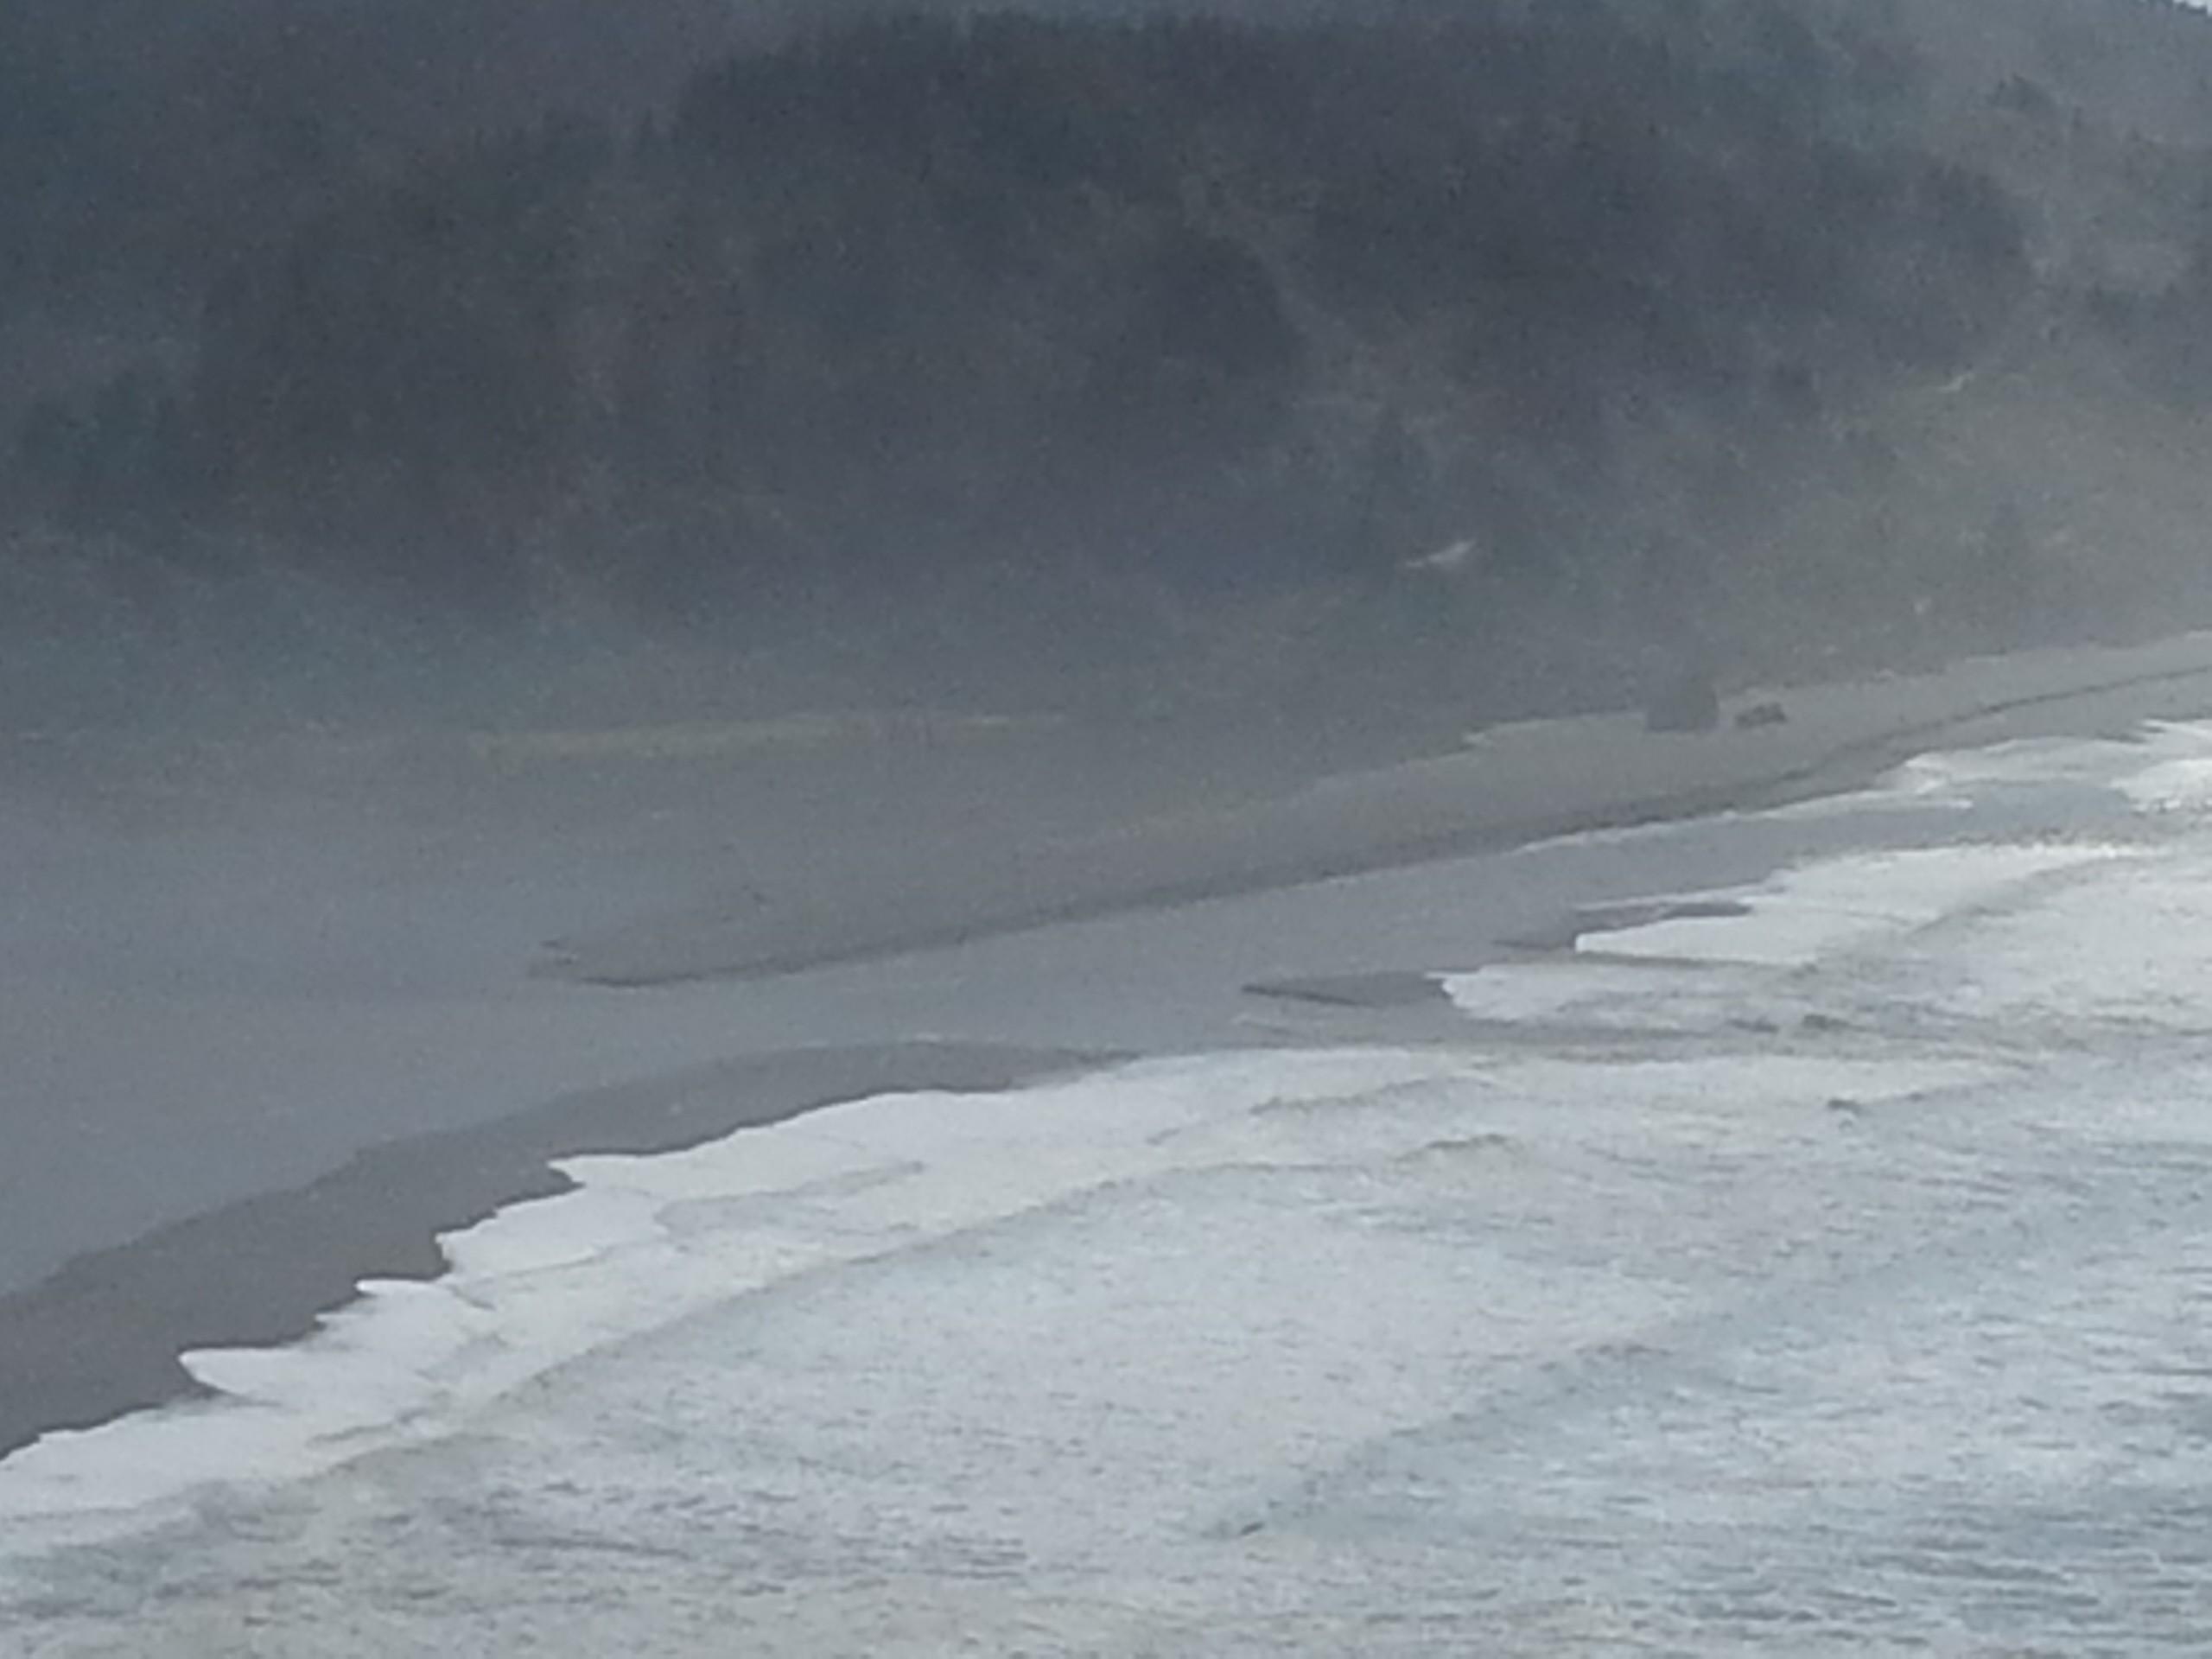 Klamath River mouth today, Sept. 30. - PHOTO BY SARA BOROK